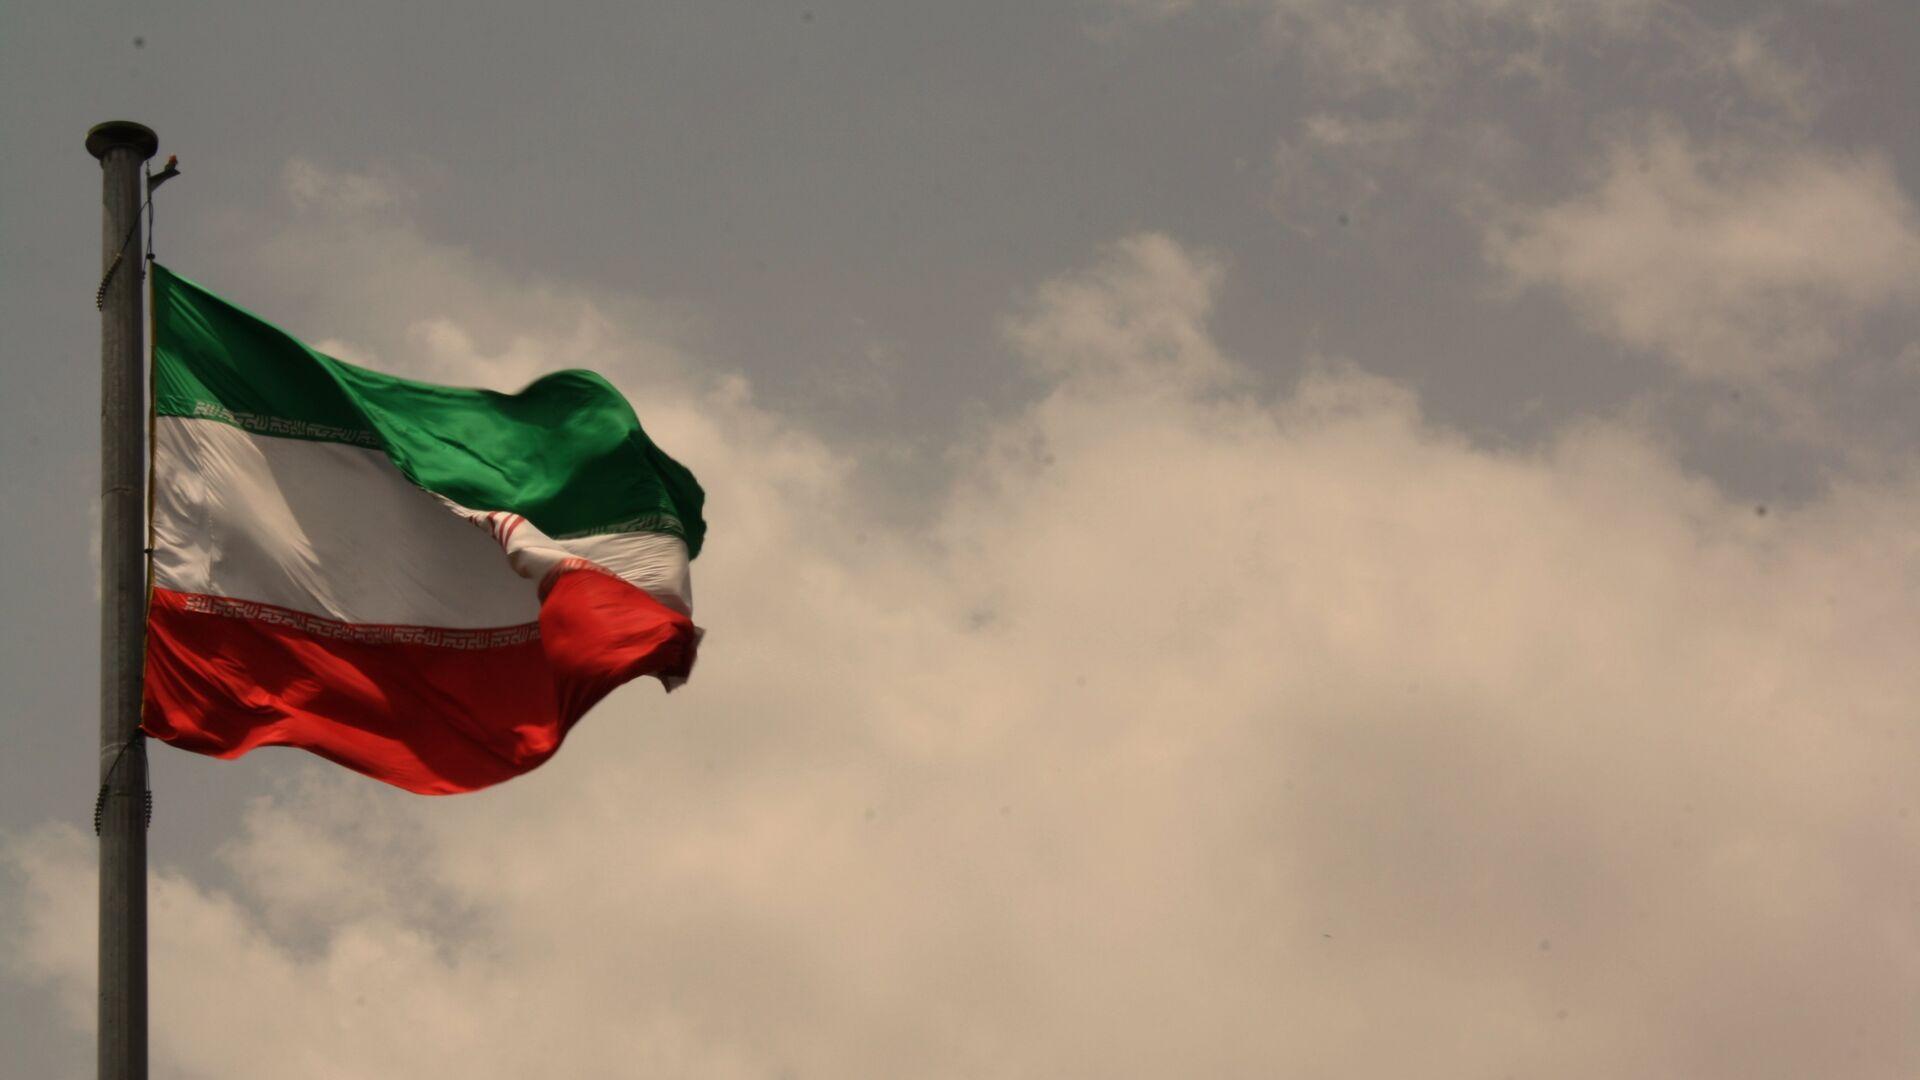 La bandera de Irán - Sputnik Mundo, 1920, 25.07.2021